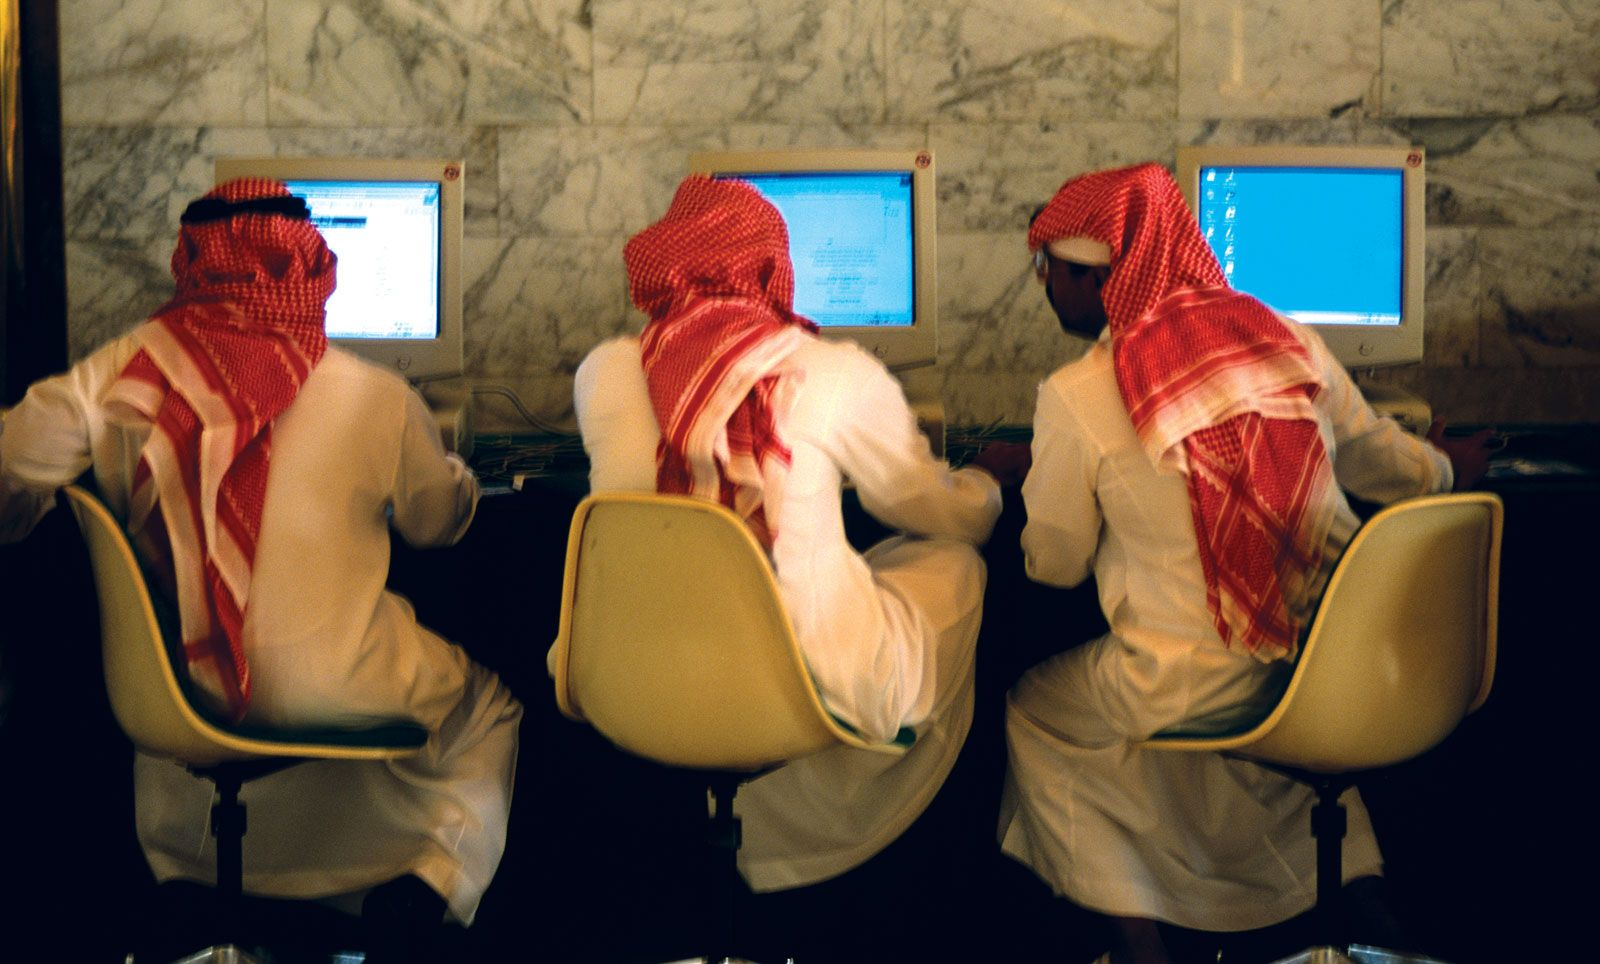 Arabia Saudita, quando il blog costa 600 frustate